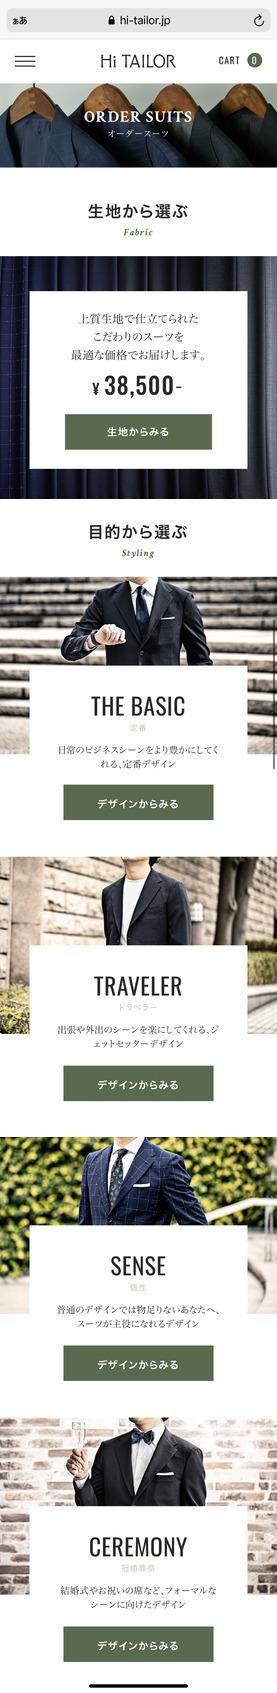 Hi TAILOR(ハイ・テーラー) 公式サイト 生地の目的別検索画面